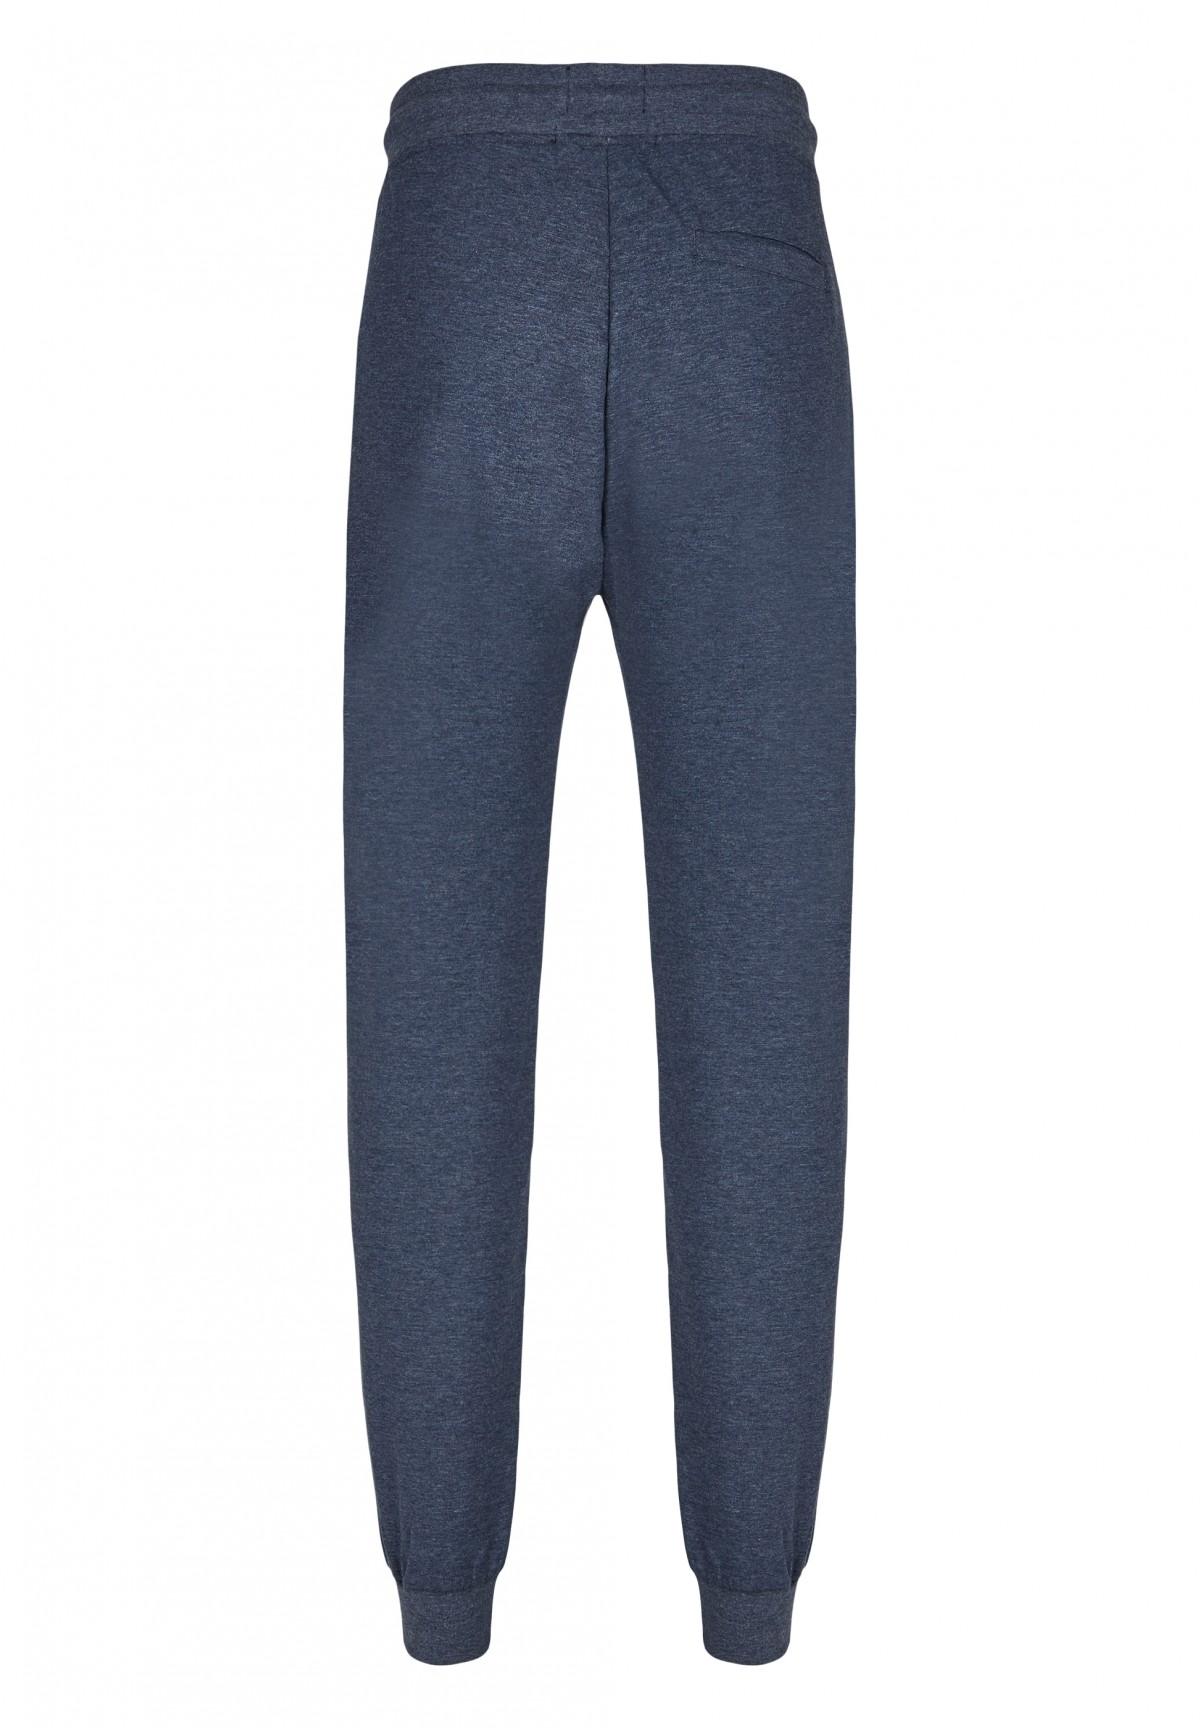 Pantalon de Jogging /